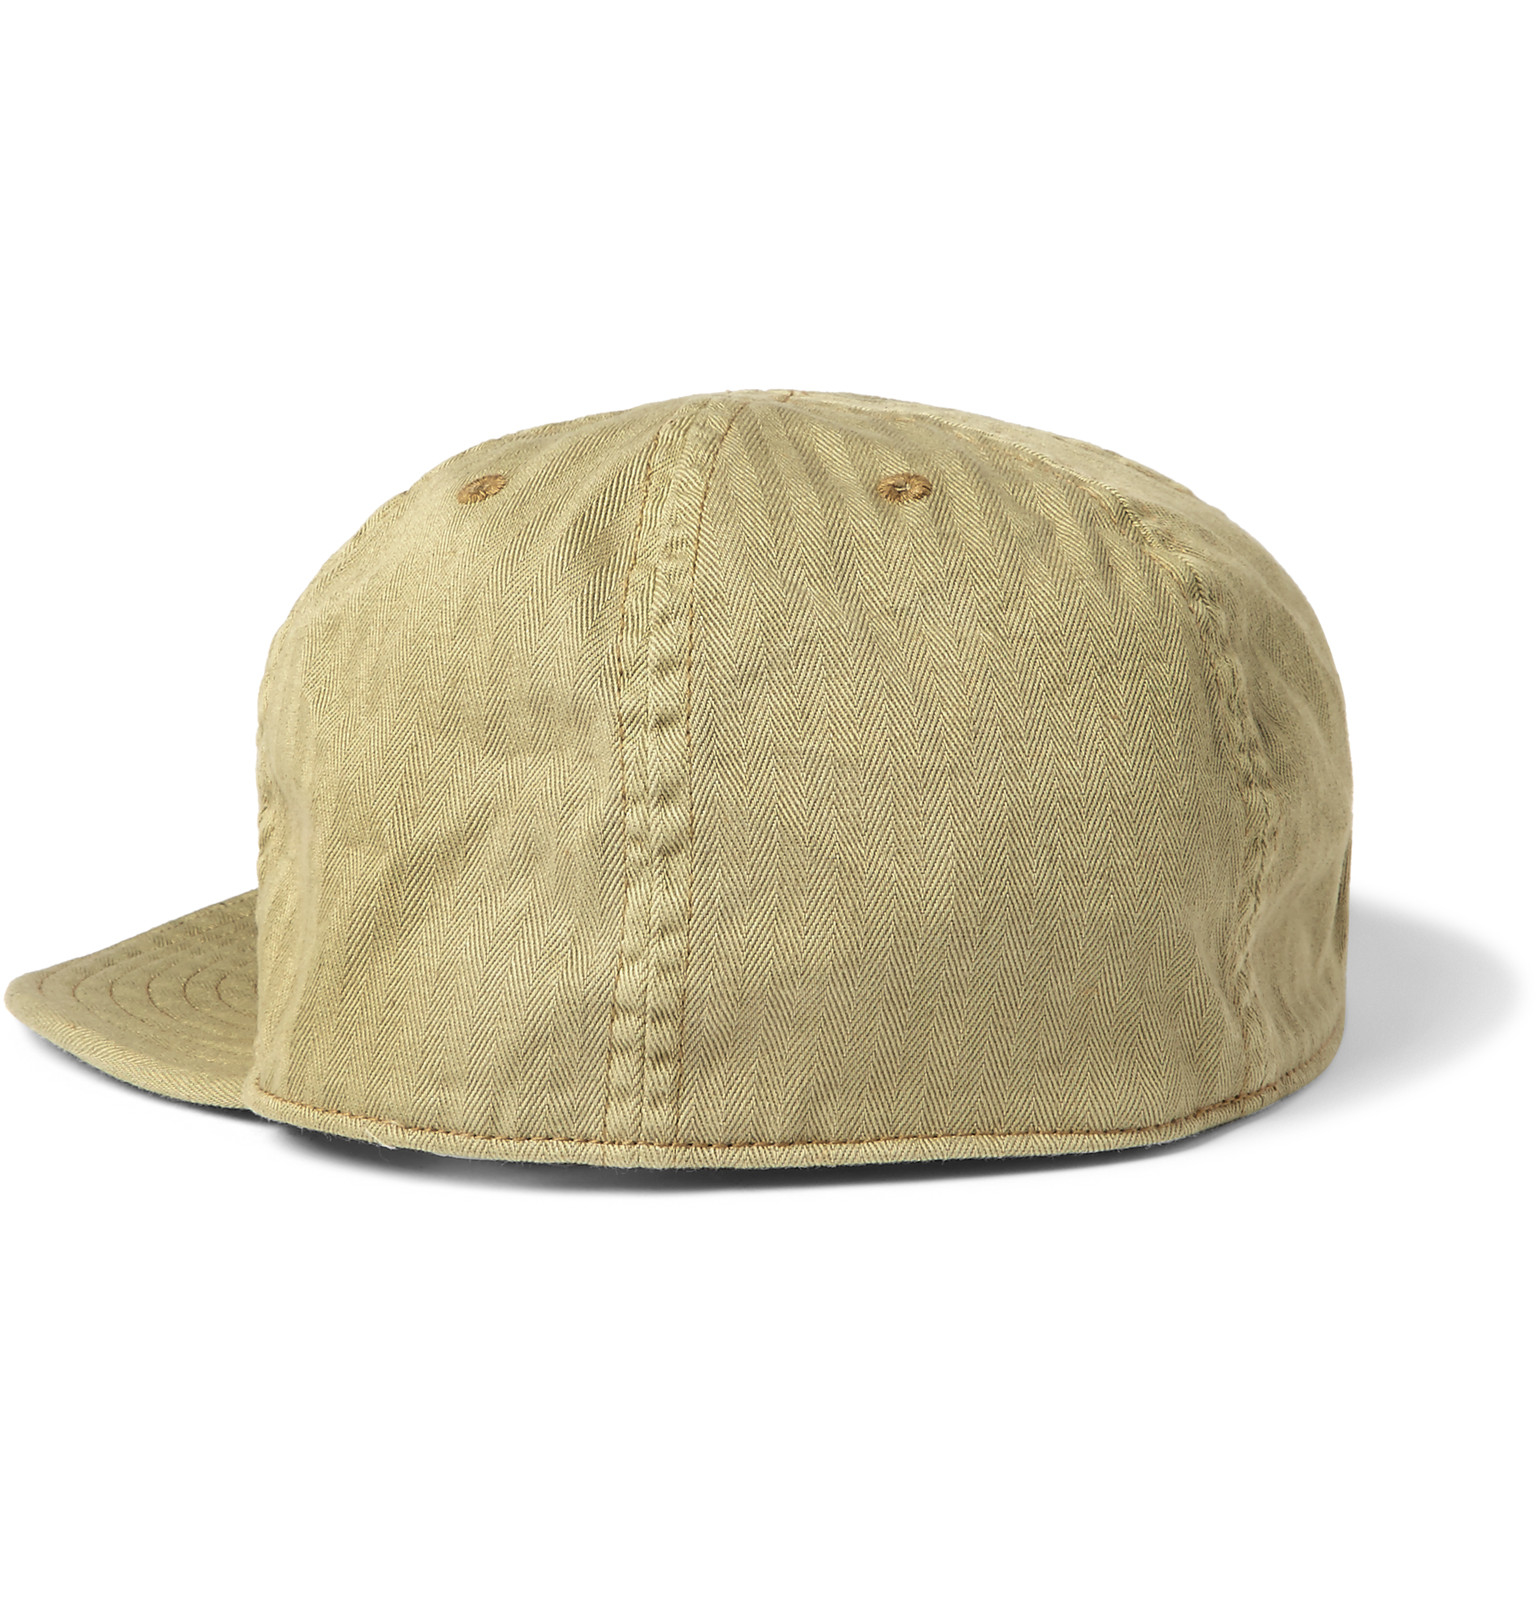 Design custom made cotton caps online. Free shipping, bulk discounts and no minimums or setups for custom made cotton hats. Free design templates. Over 10 million customer designs since